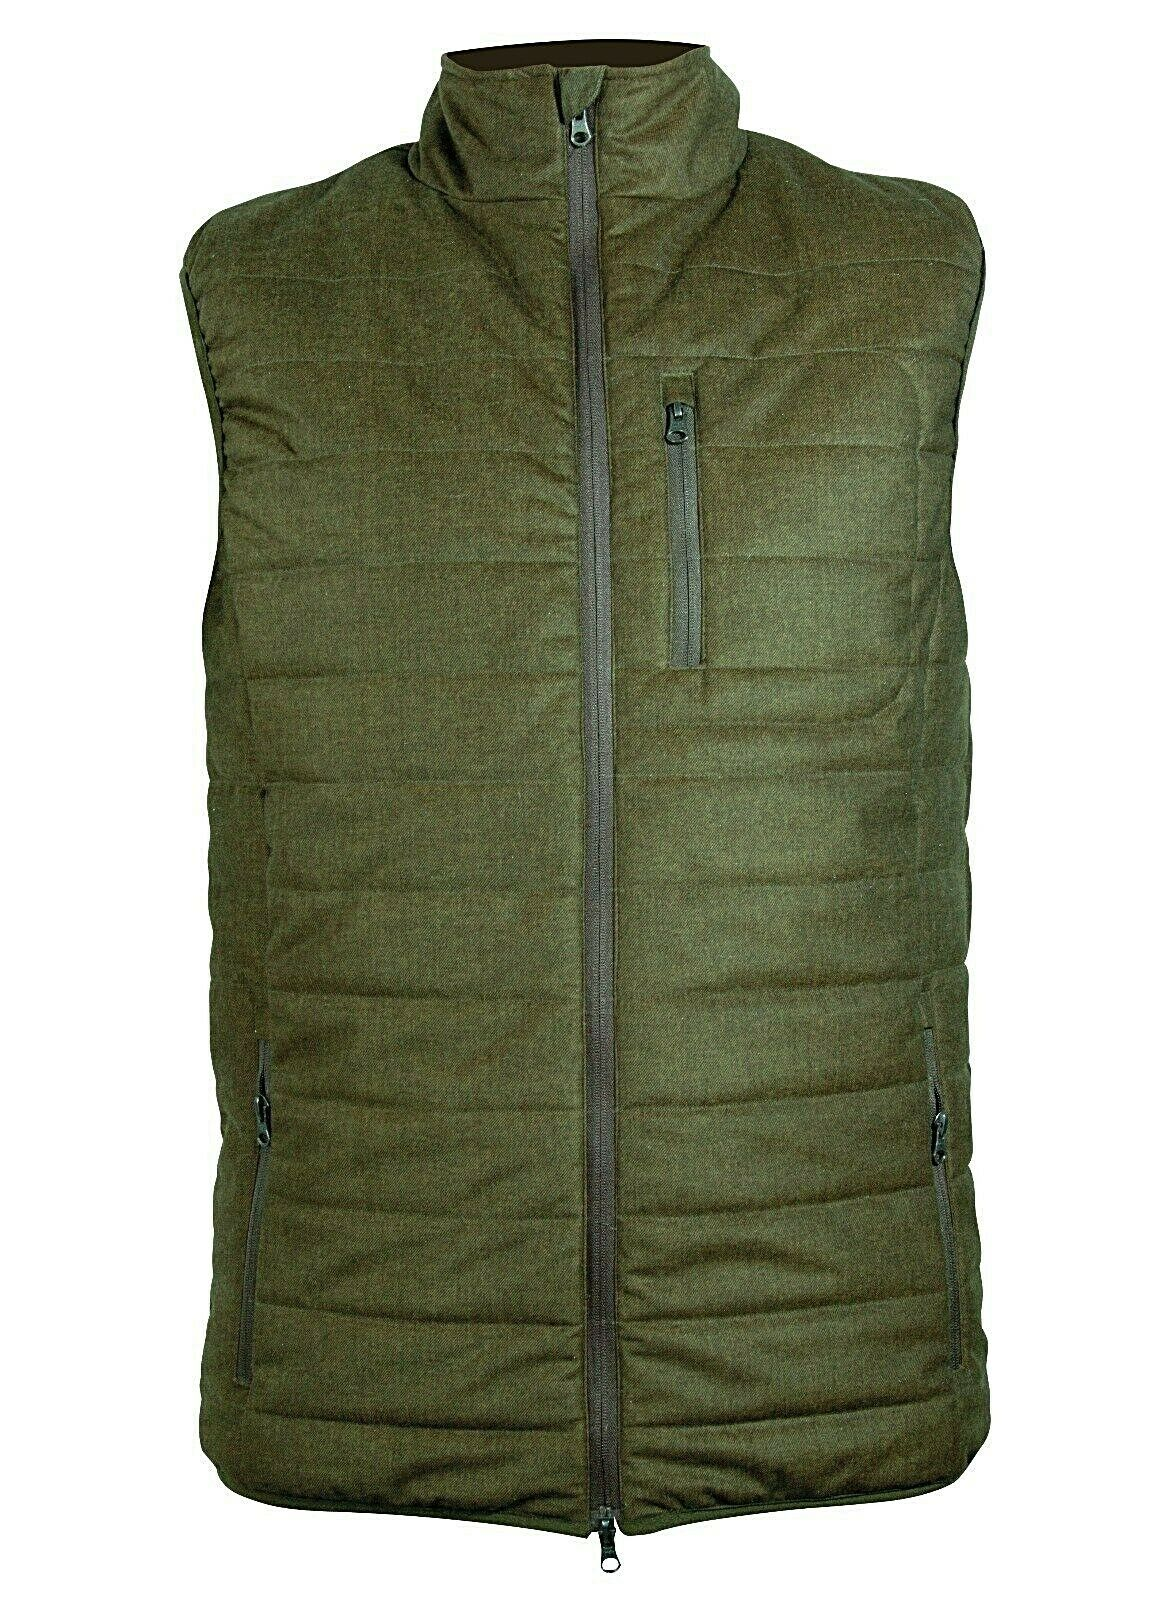 Nieuw.Hart Body Warmer Ascott-V. groen. Xhasv.